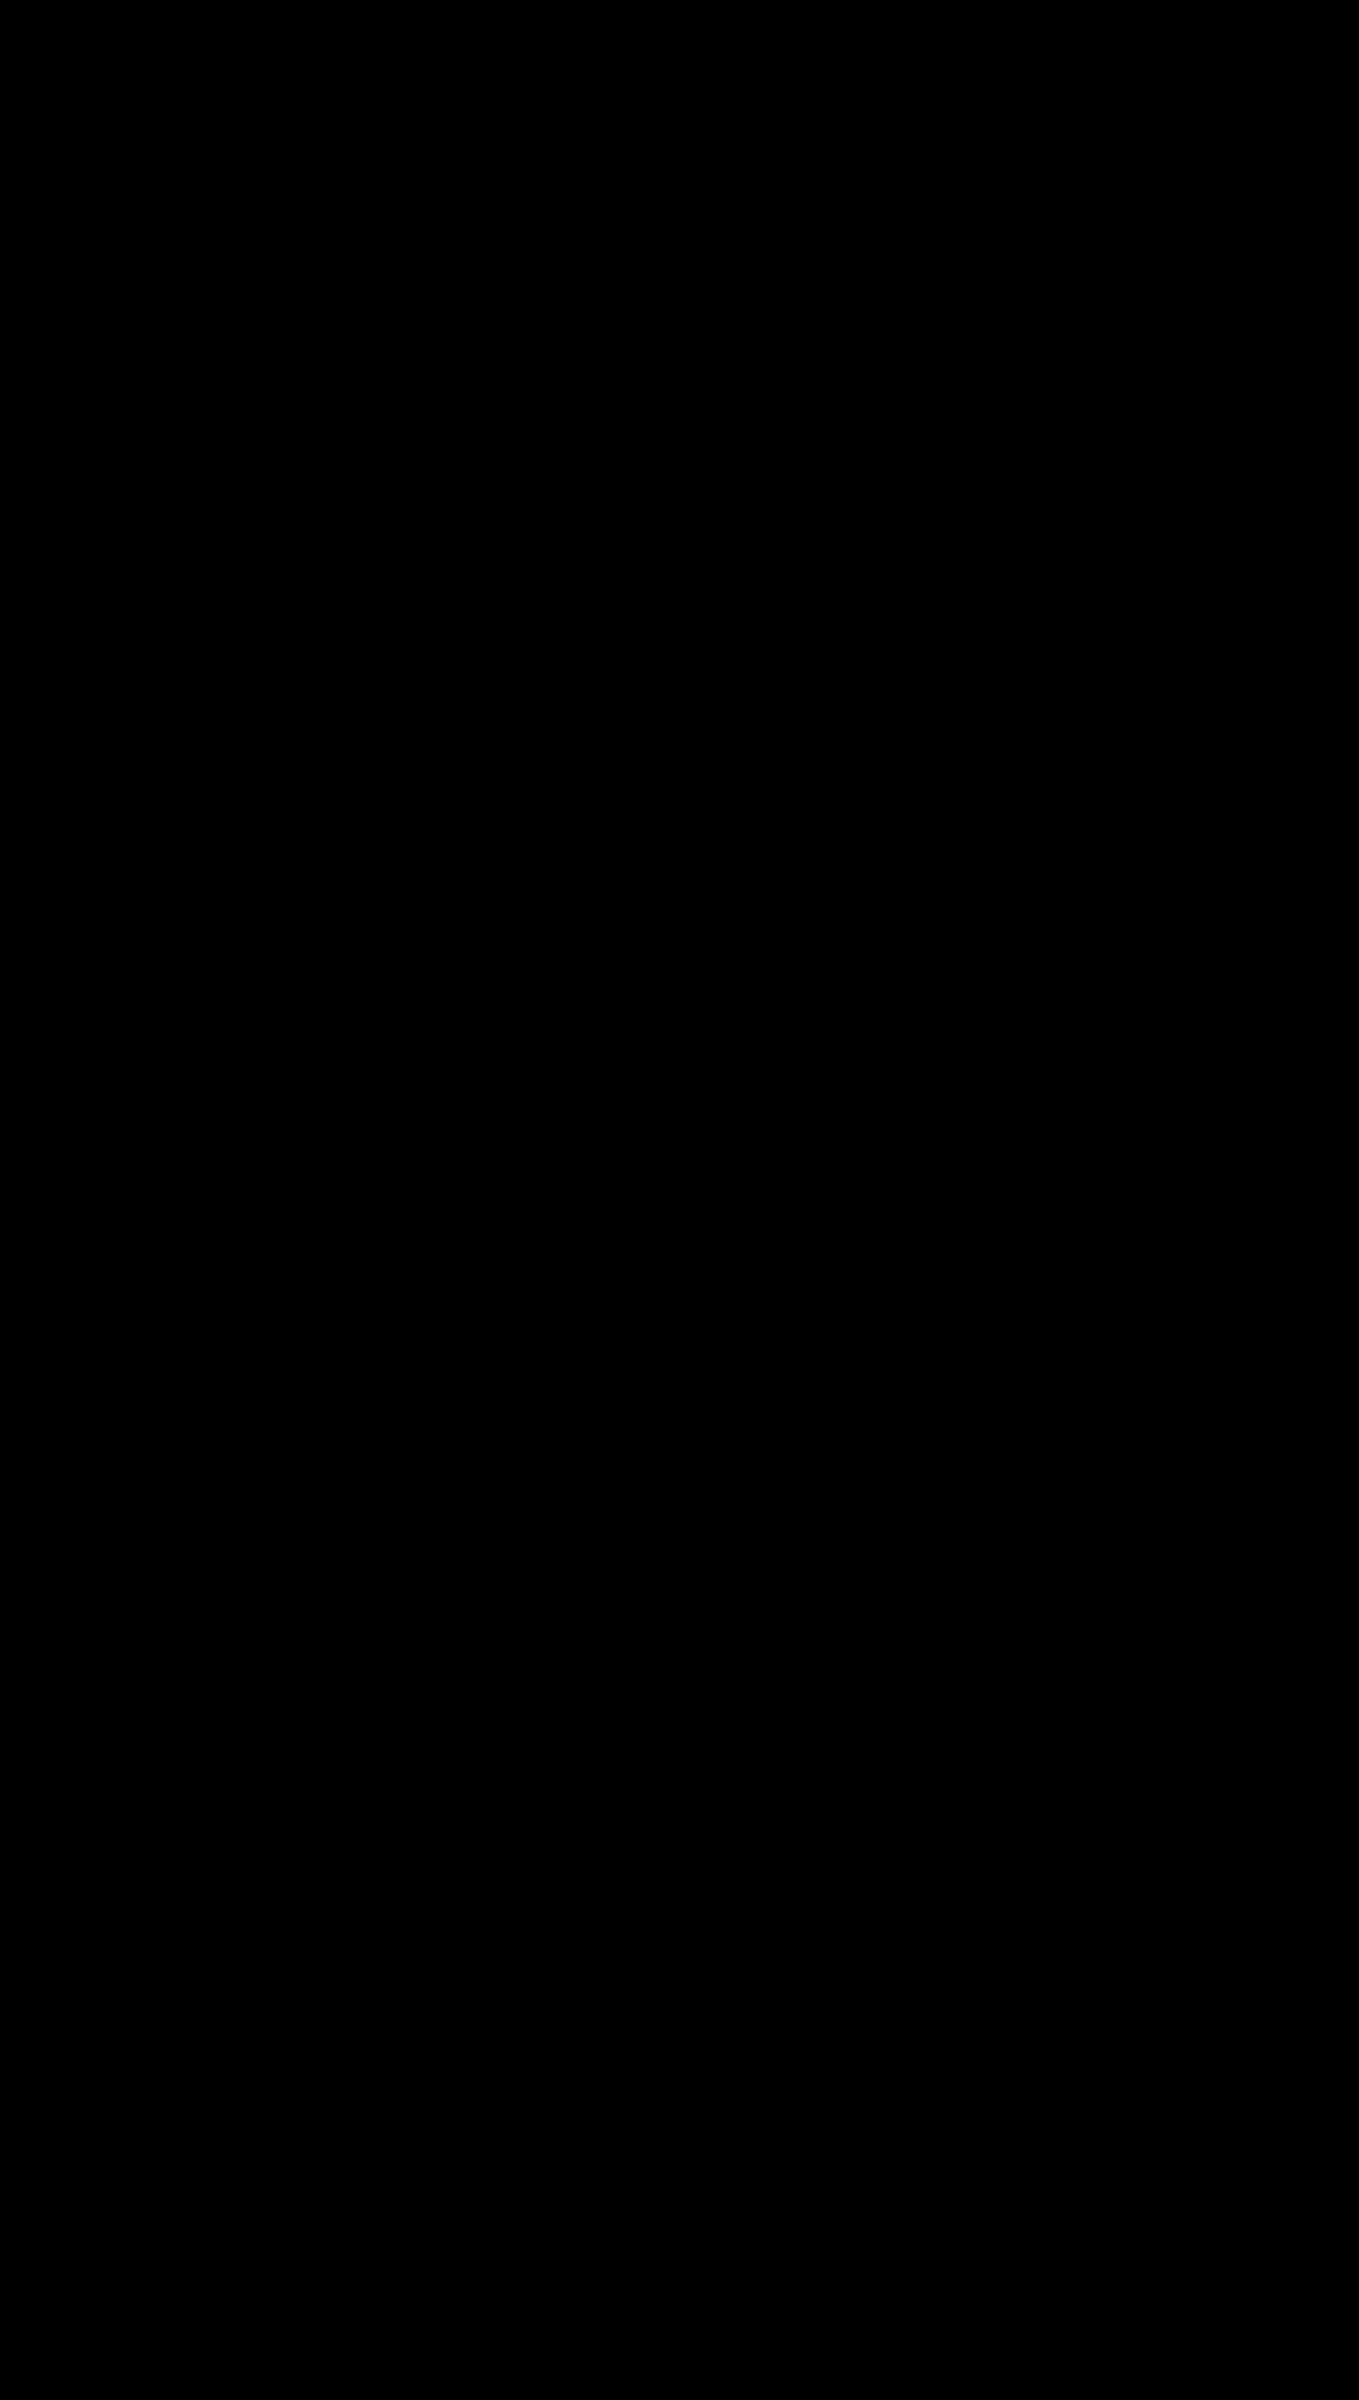 Clipart - Horse Animation Frames